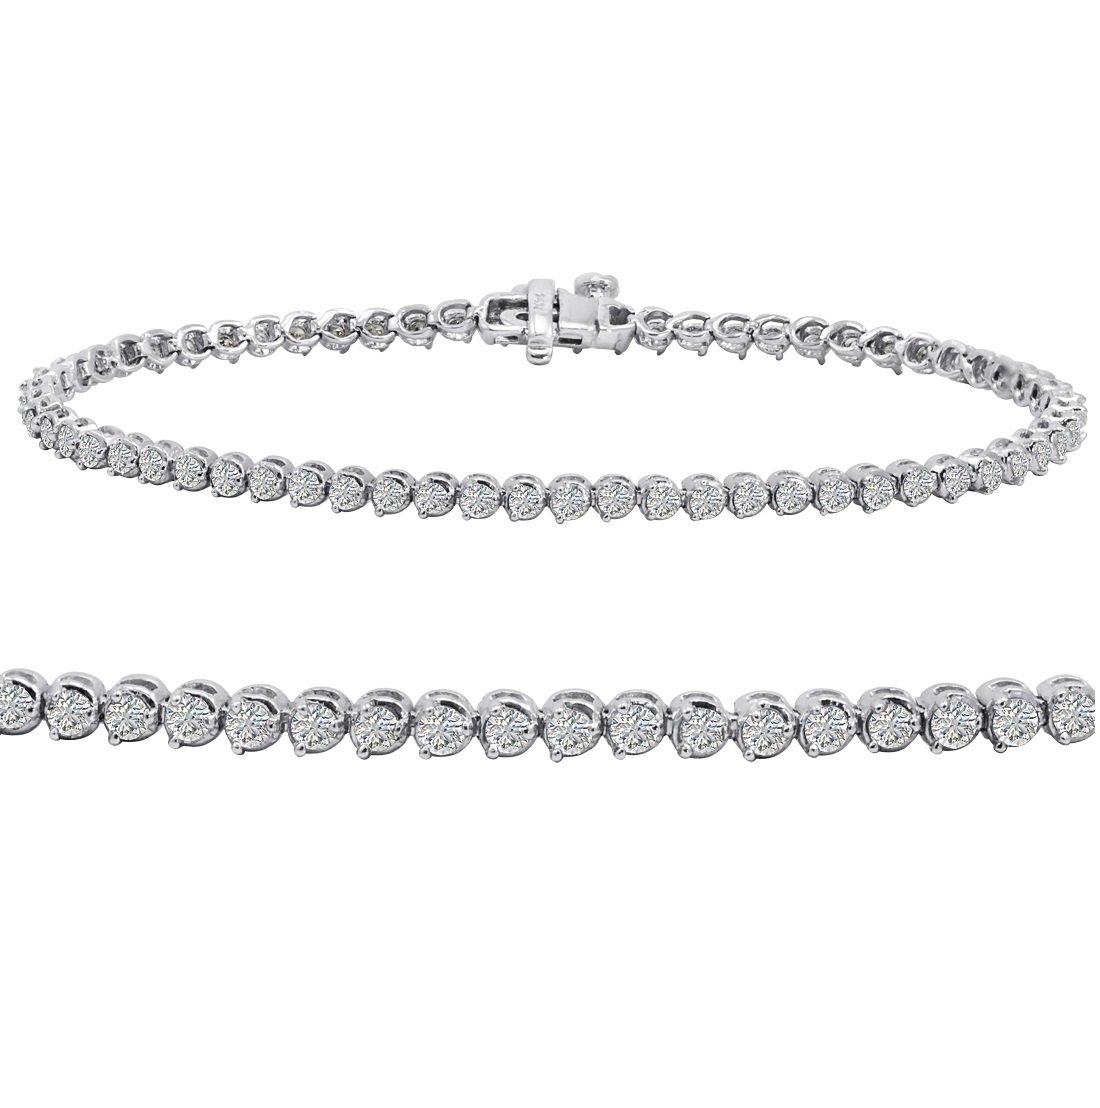 AGS Certified 2 ct tw Diamond Tennis Bracelet in 14K White Gold 7 inch